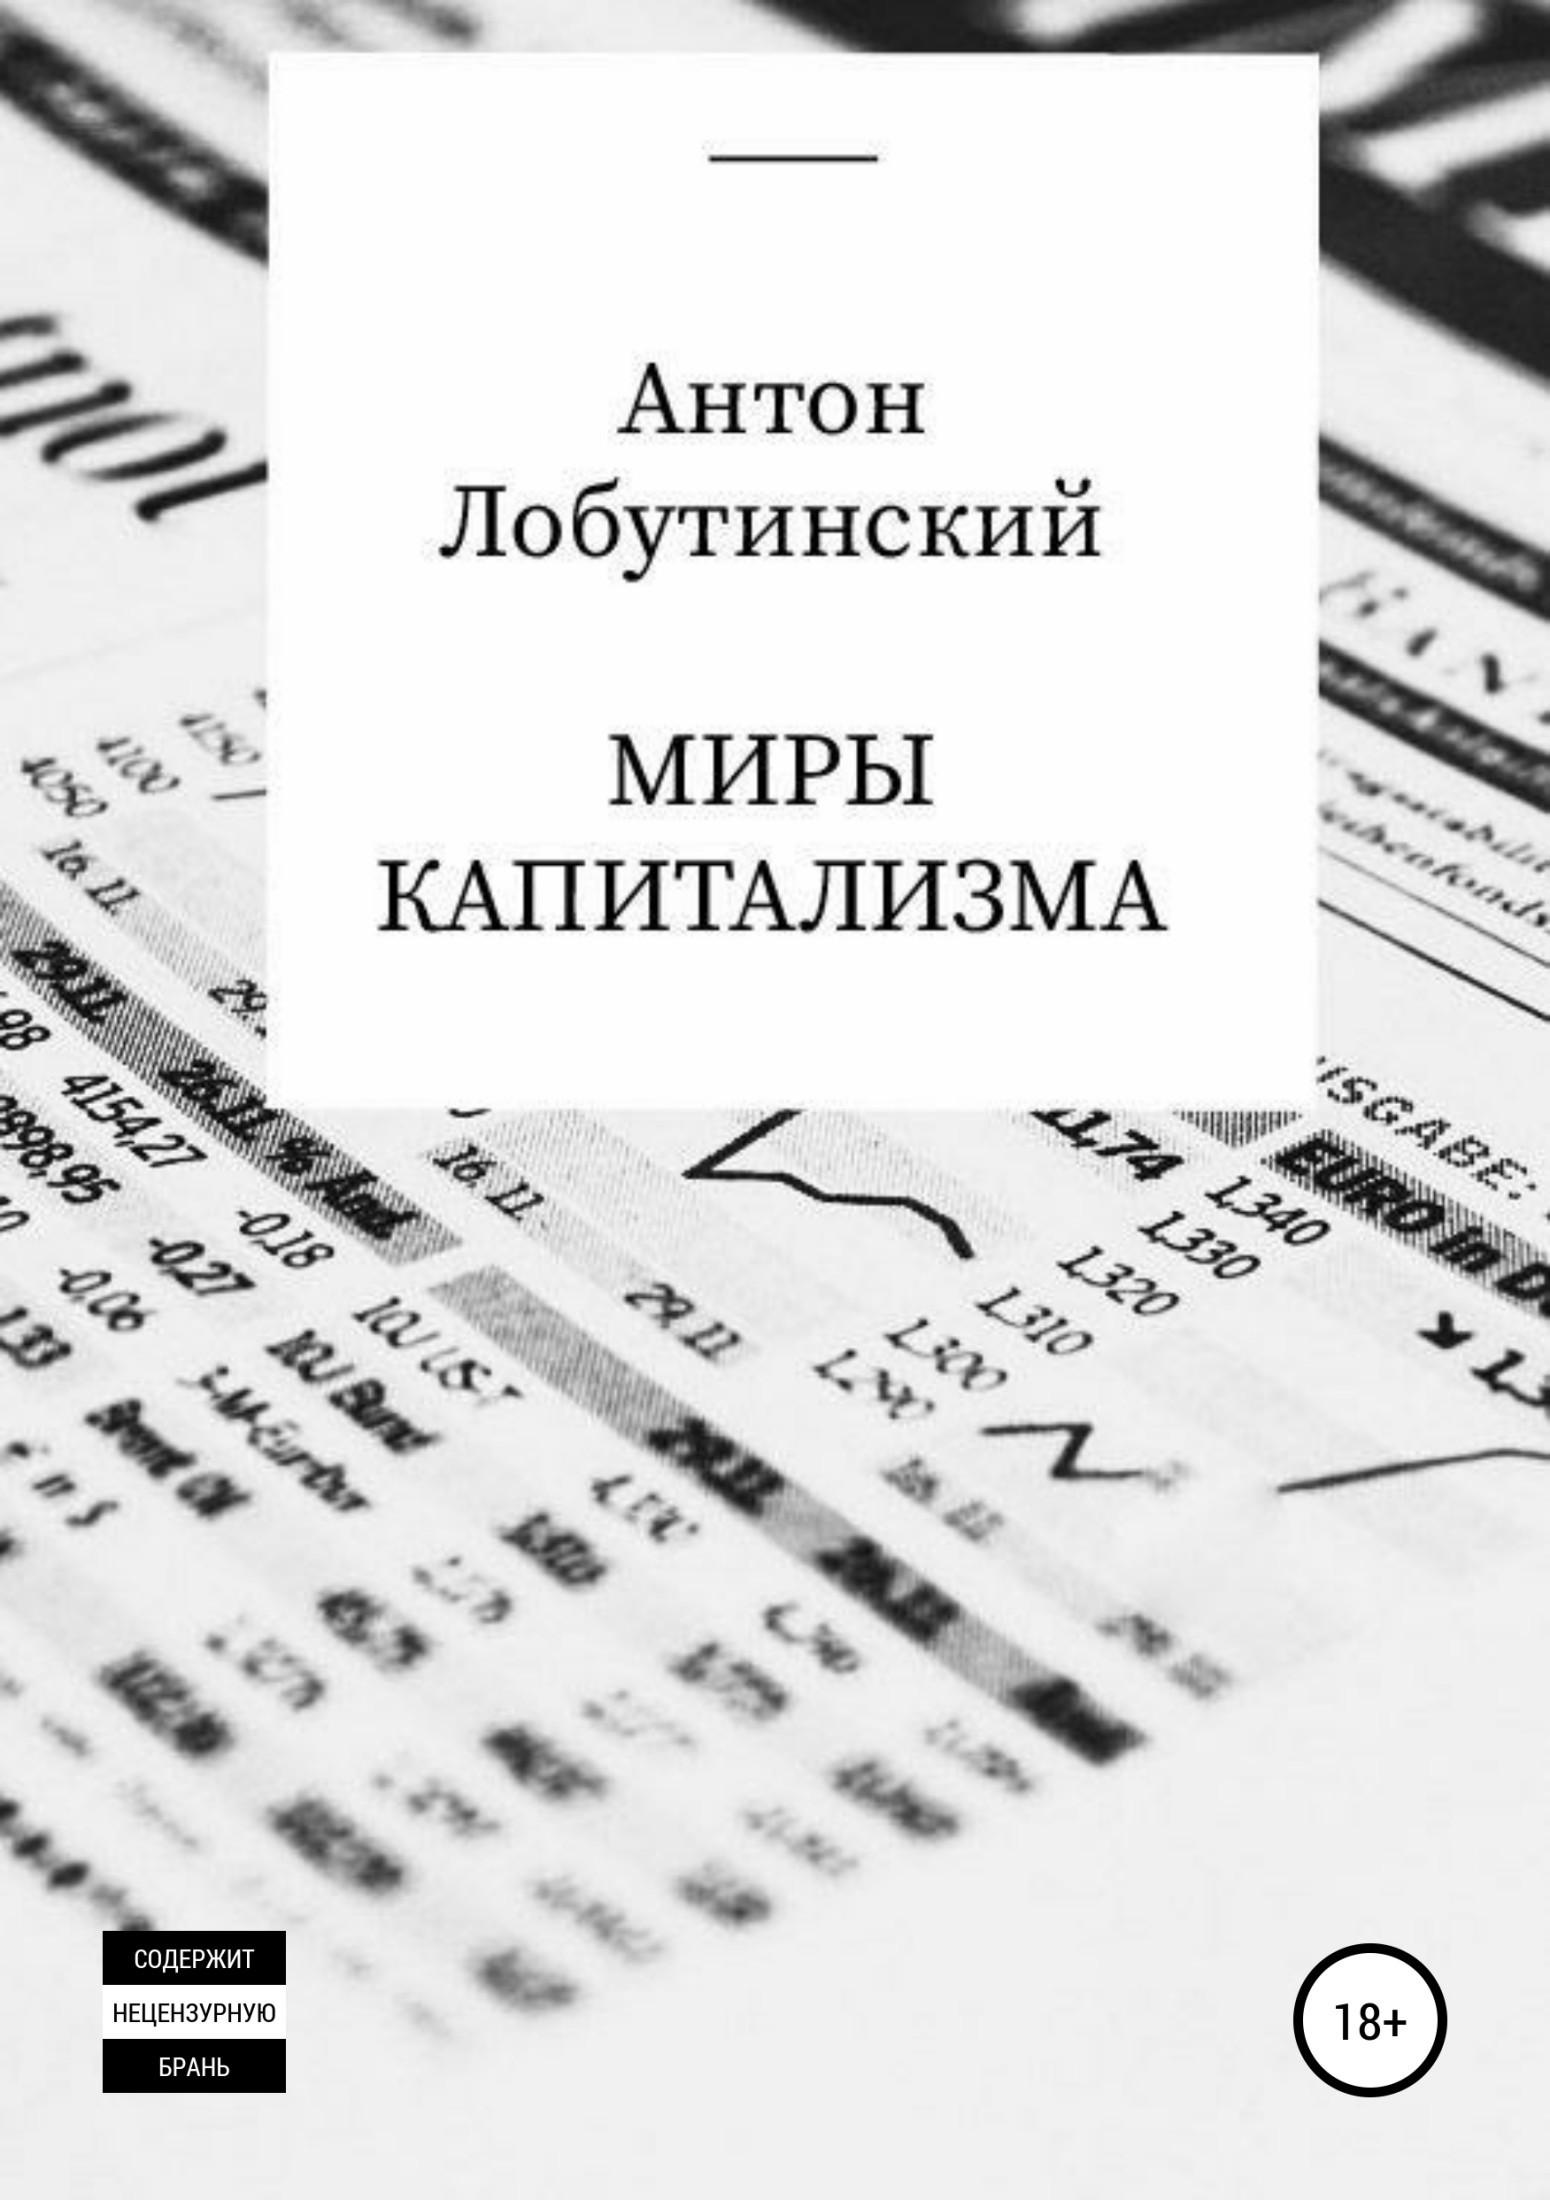 фото обложки издания Миры капитализма